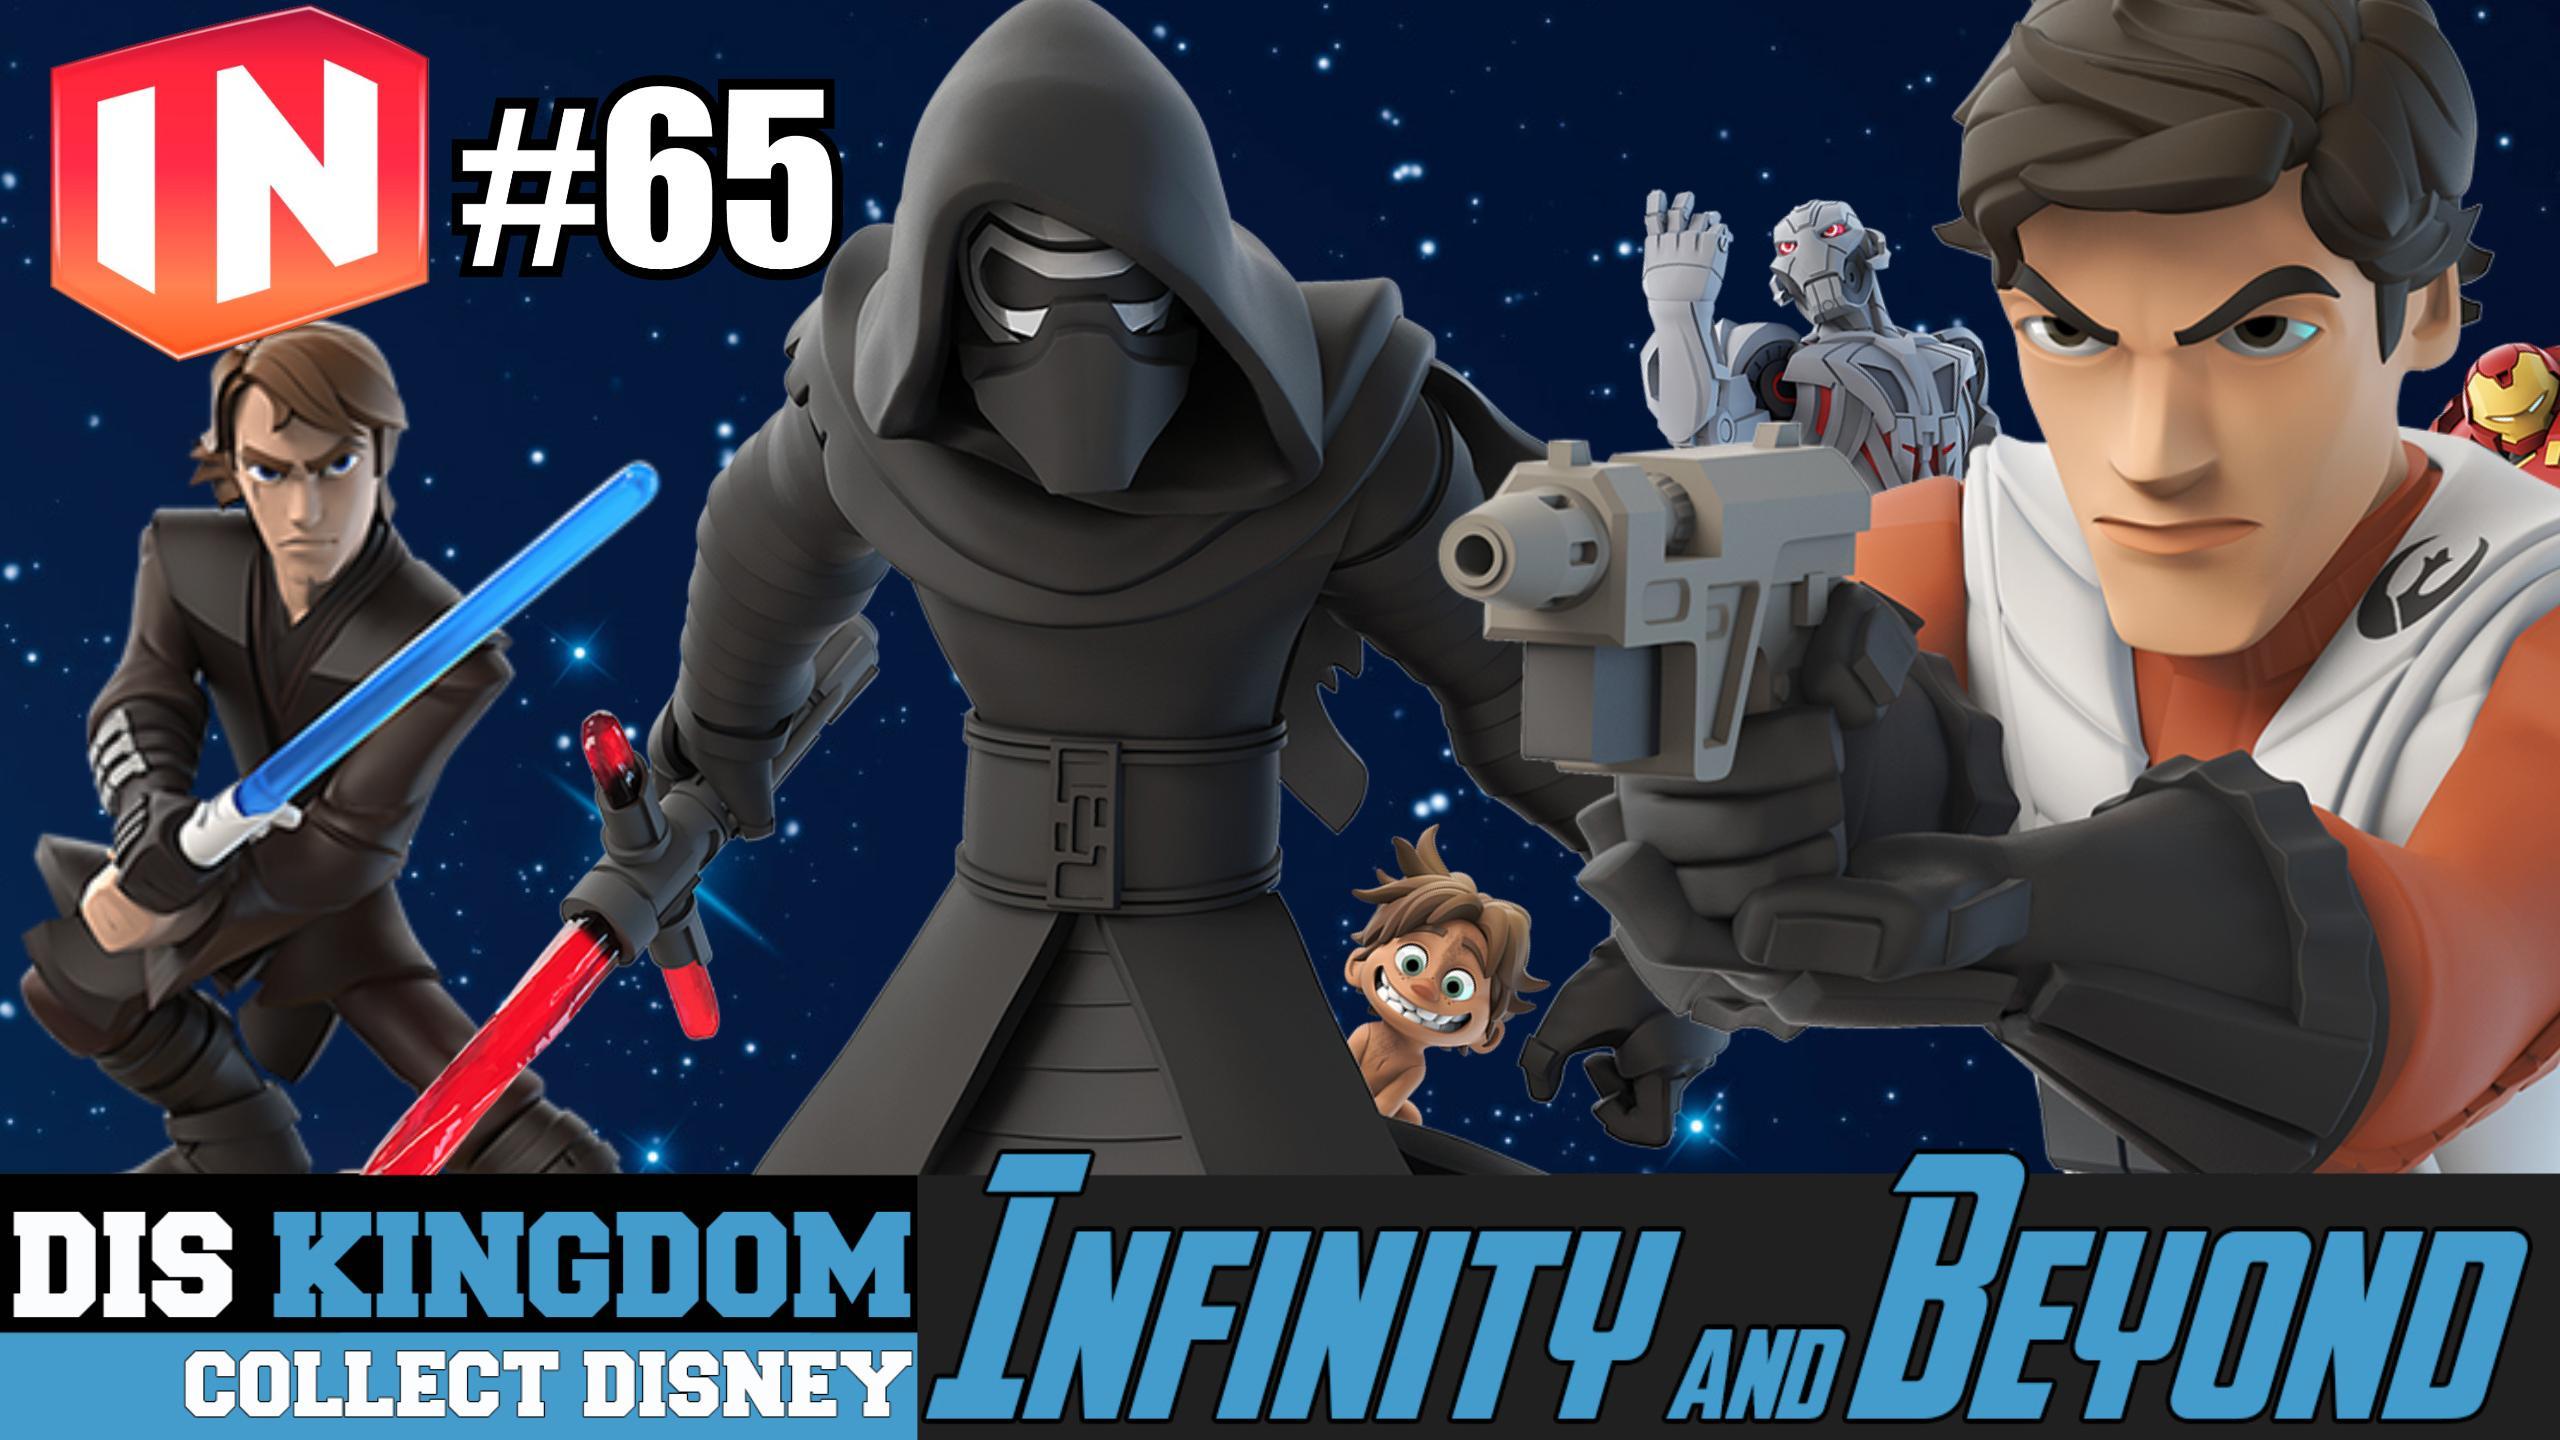 Disney Infinity 3.0 & Beyond #65 – Star Wars Light FX, PC & Much More